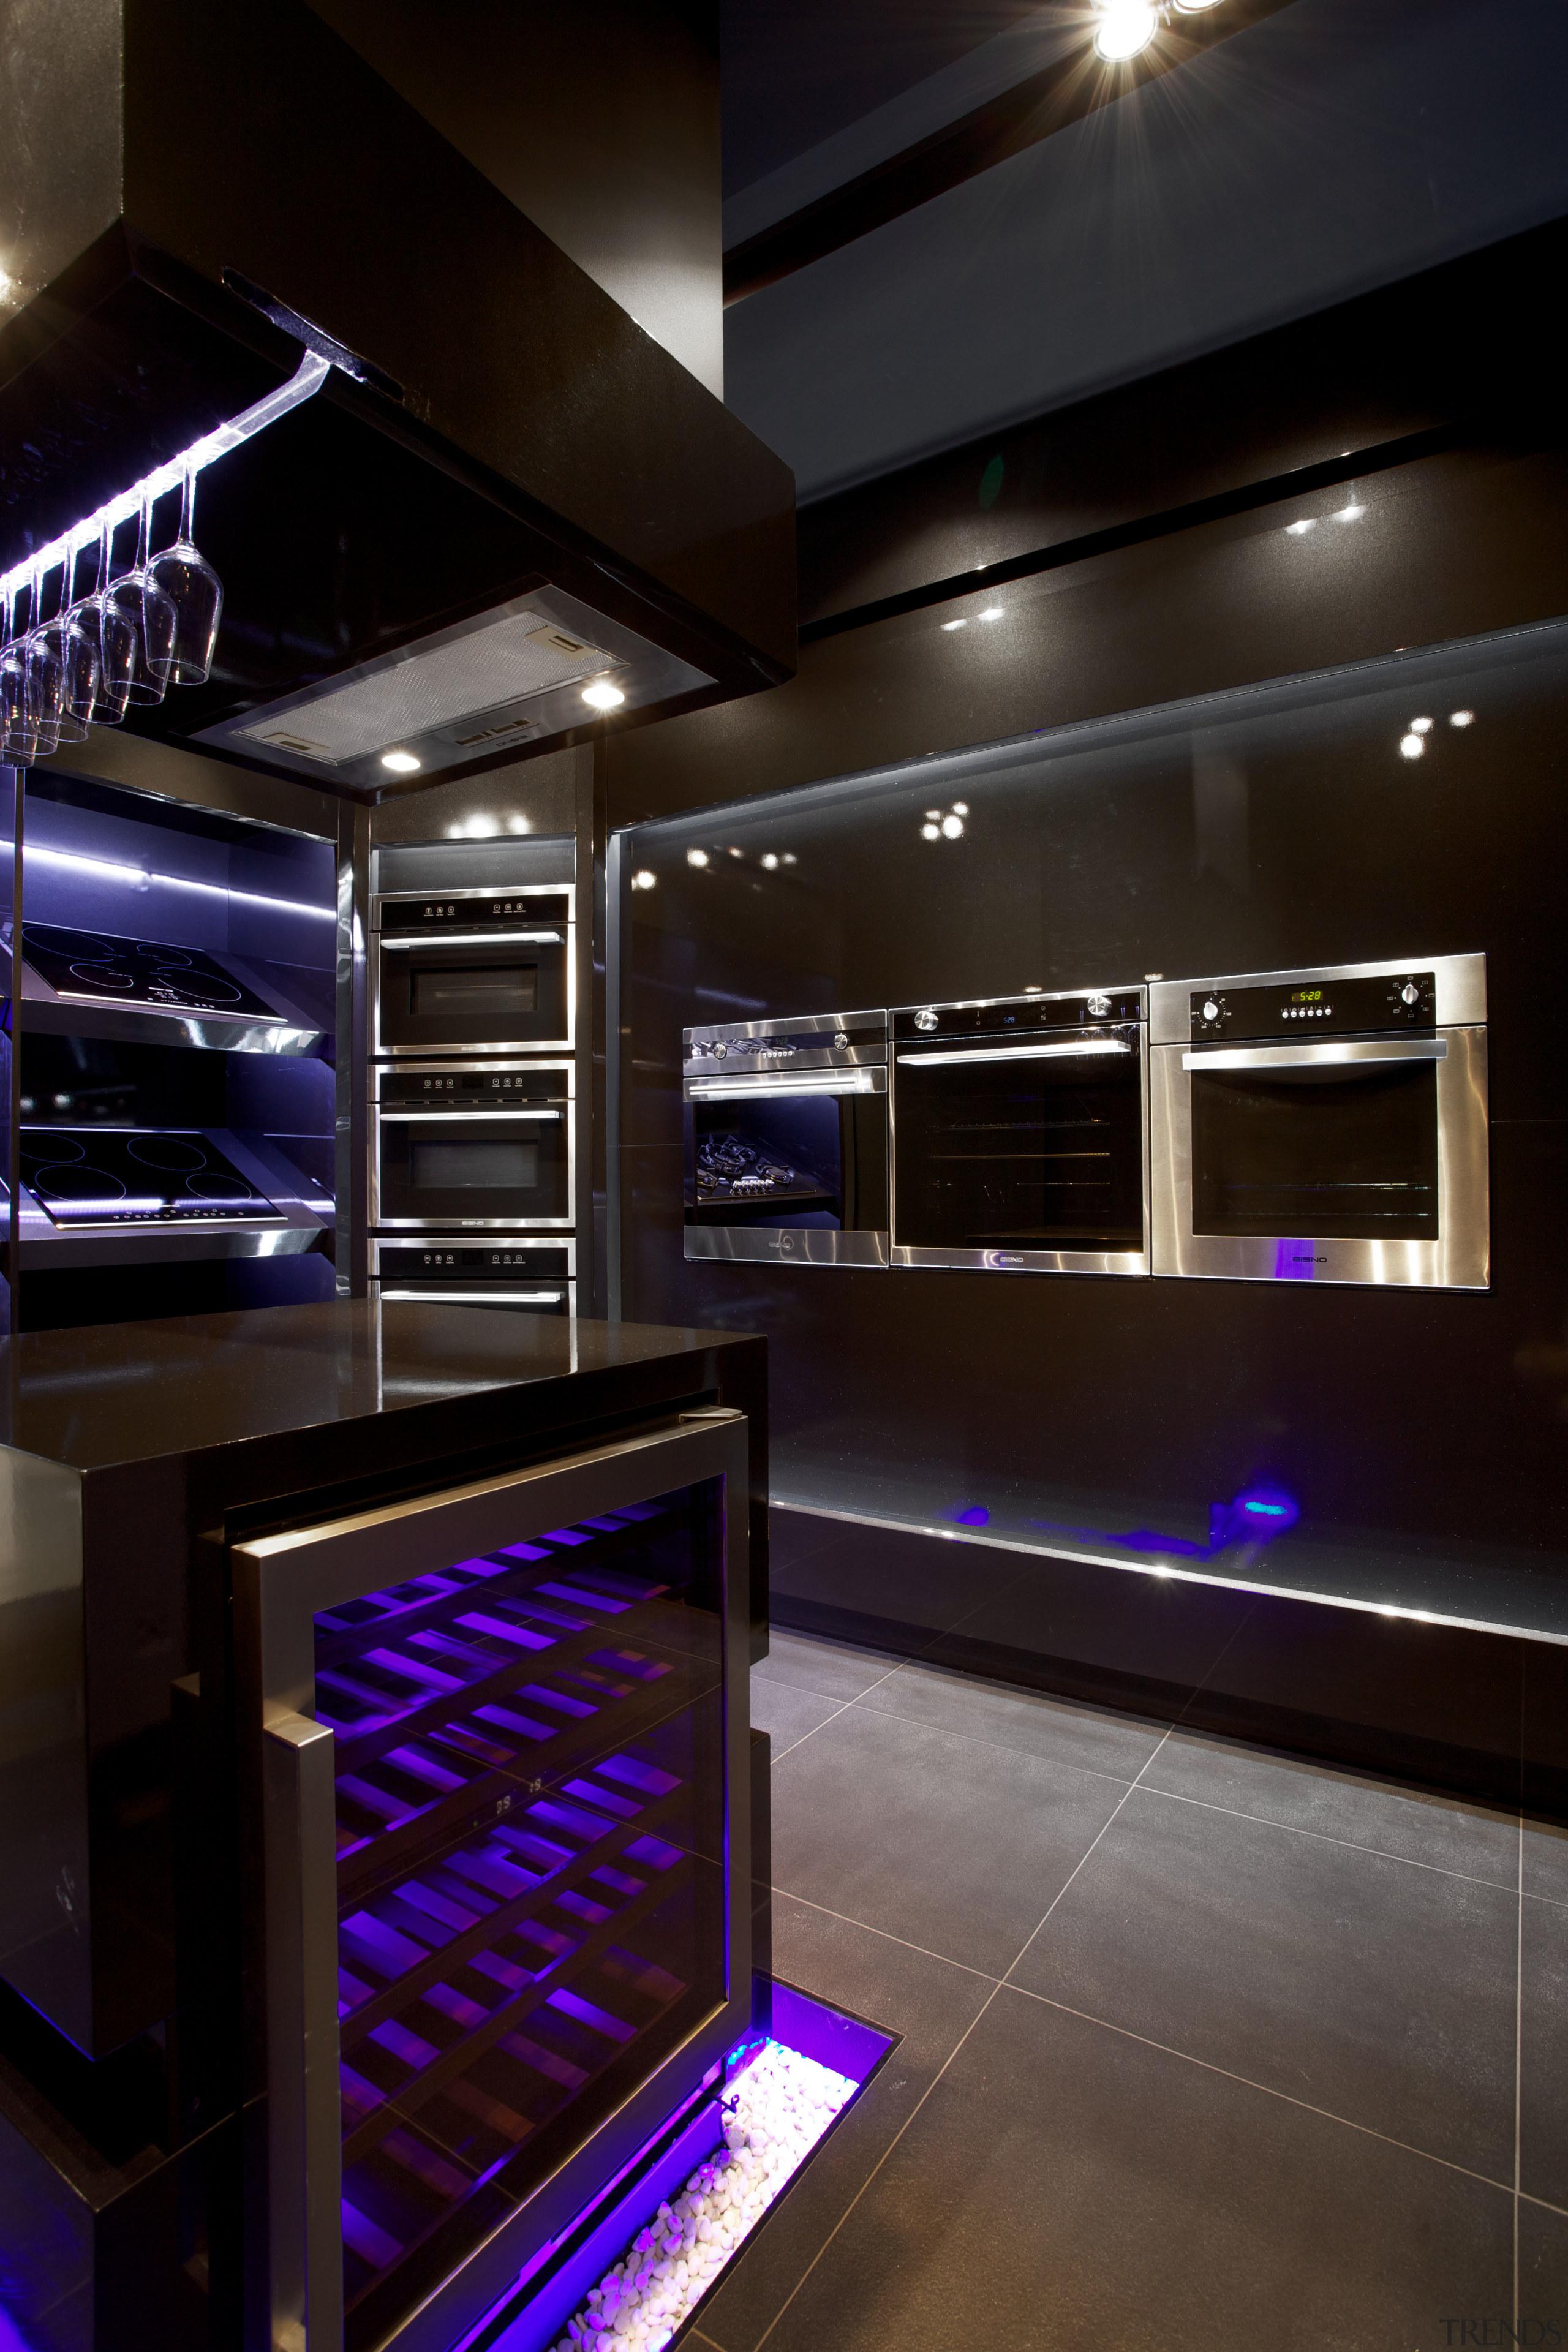 Italian designed appliances by Eisno Lifetech - Italian architecture, ceiling, interior design, kitchen, lighting, black